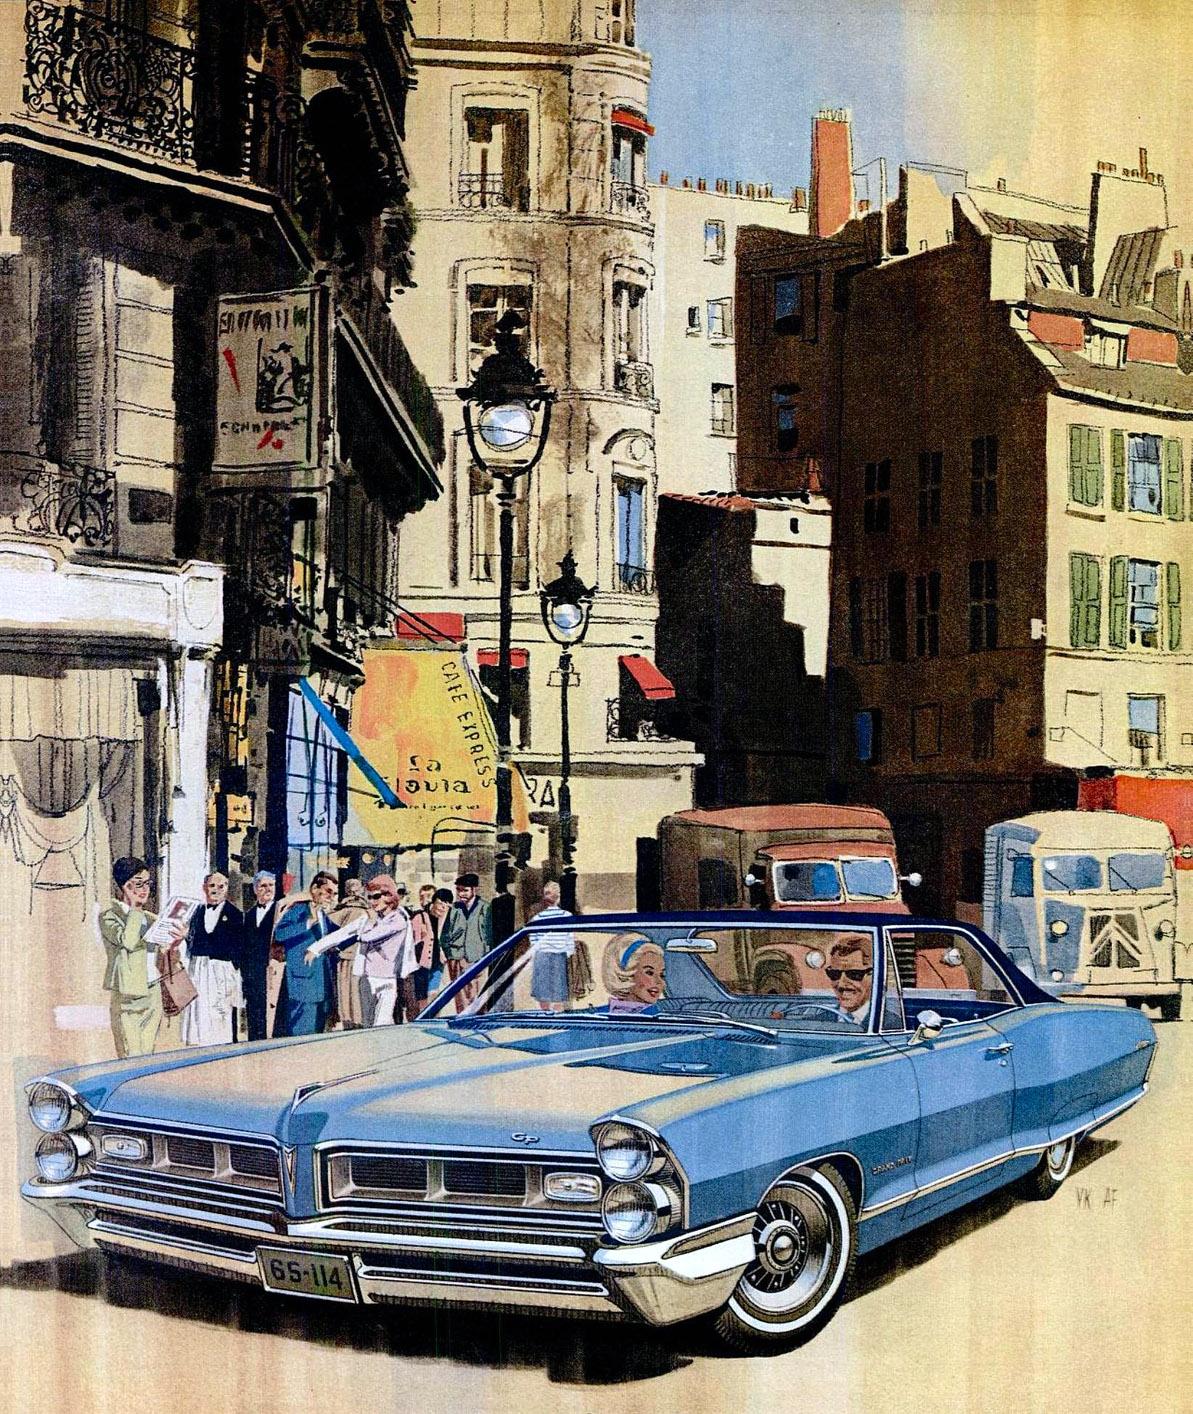 1965 Grand Prix - Rive Gauche